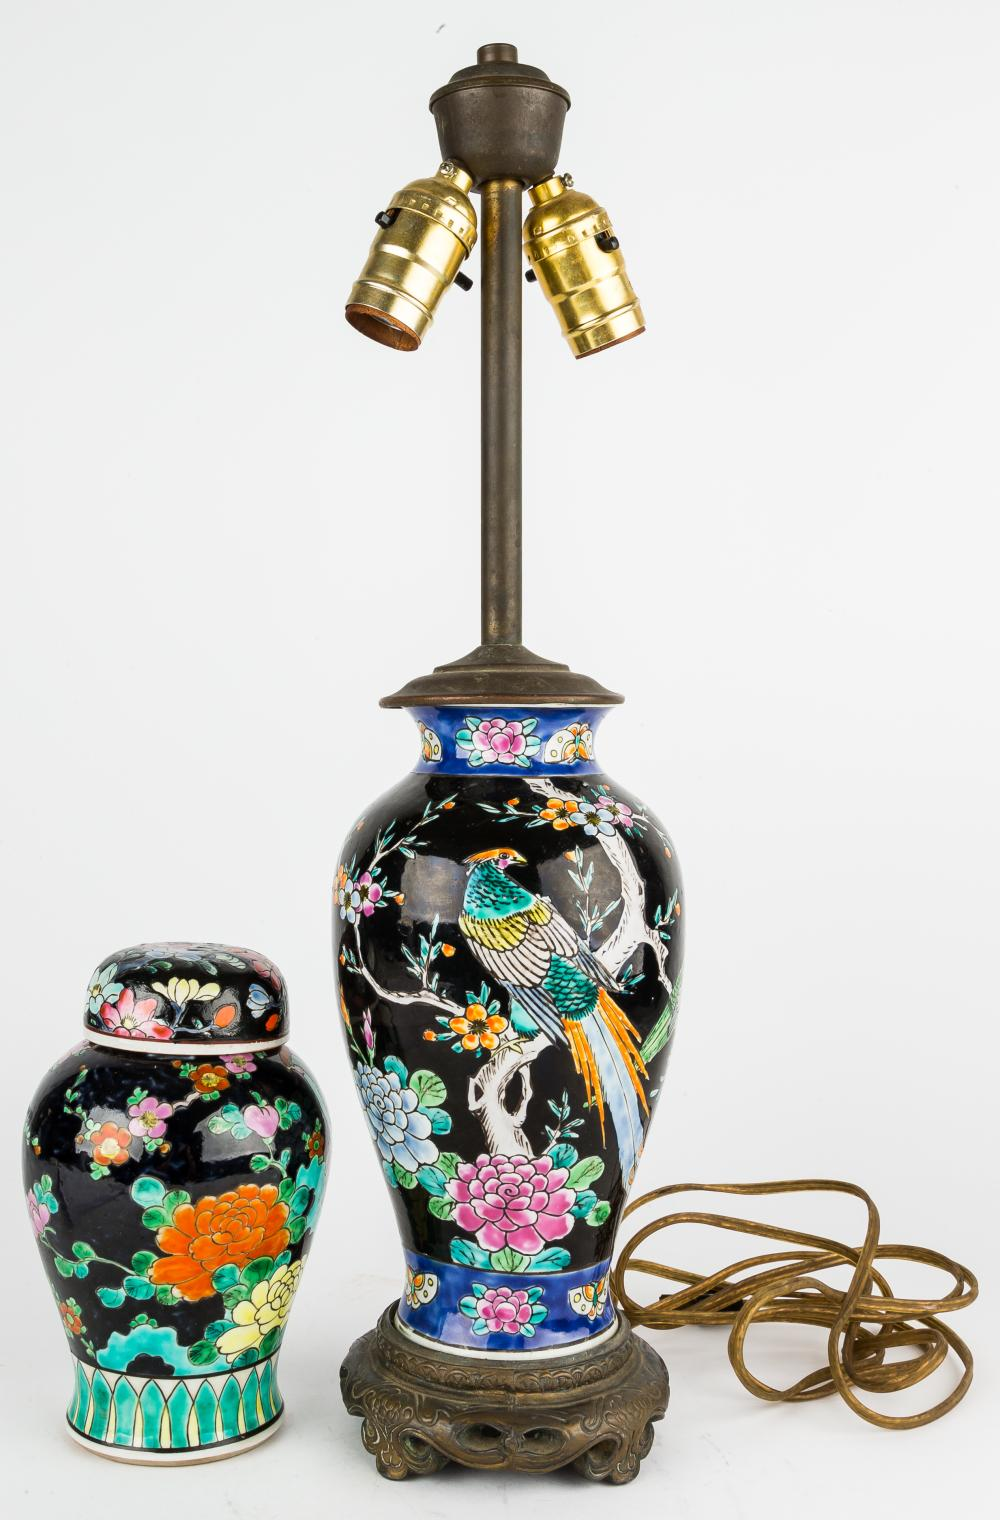 Chinese Porcelain Lamp & Vase